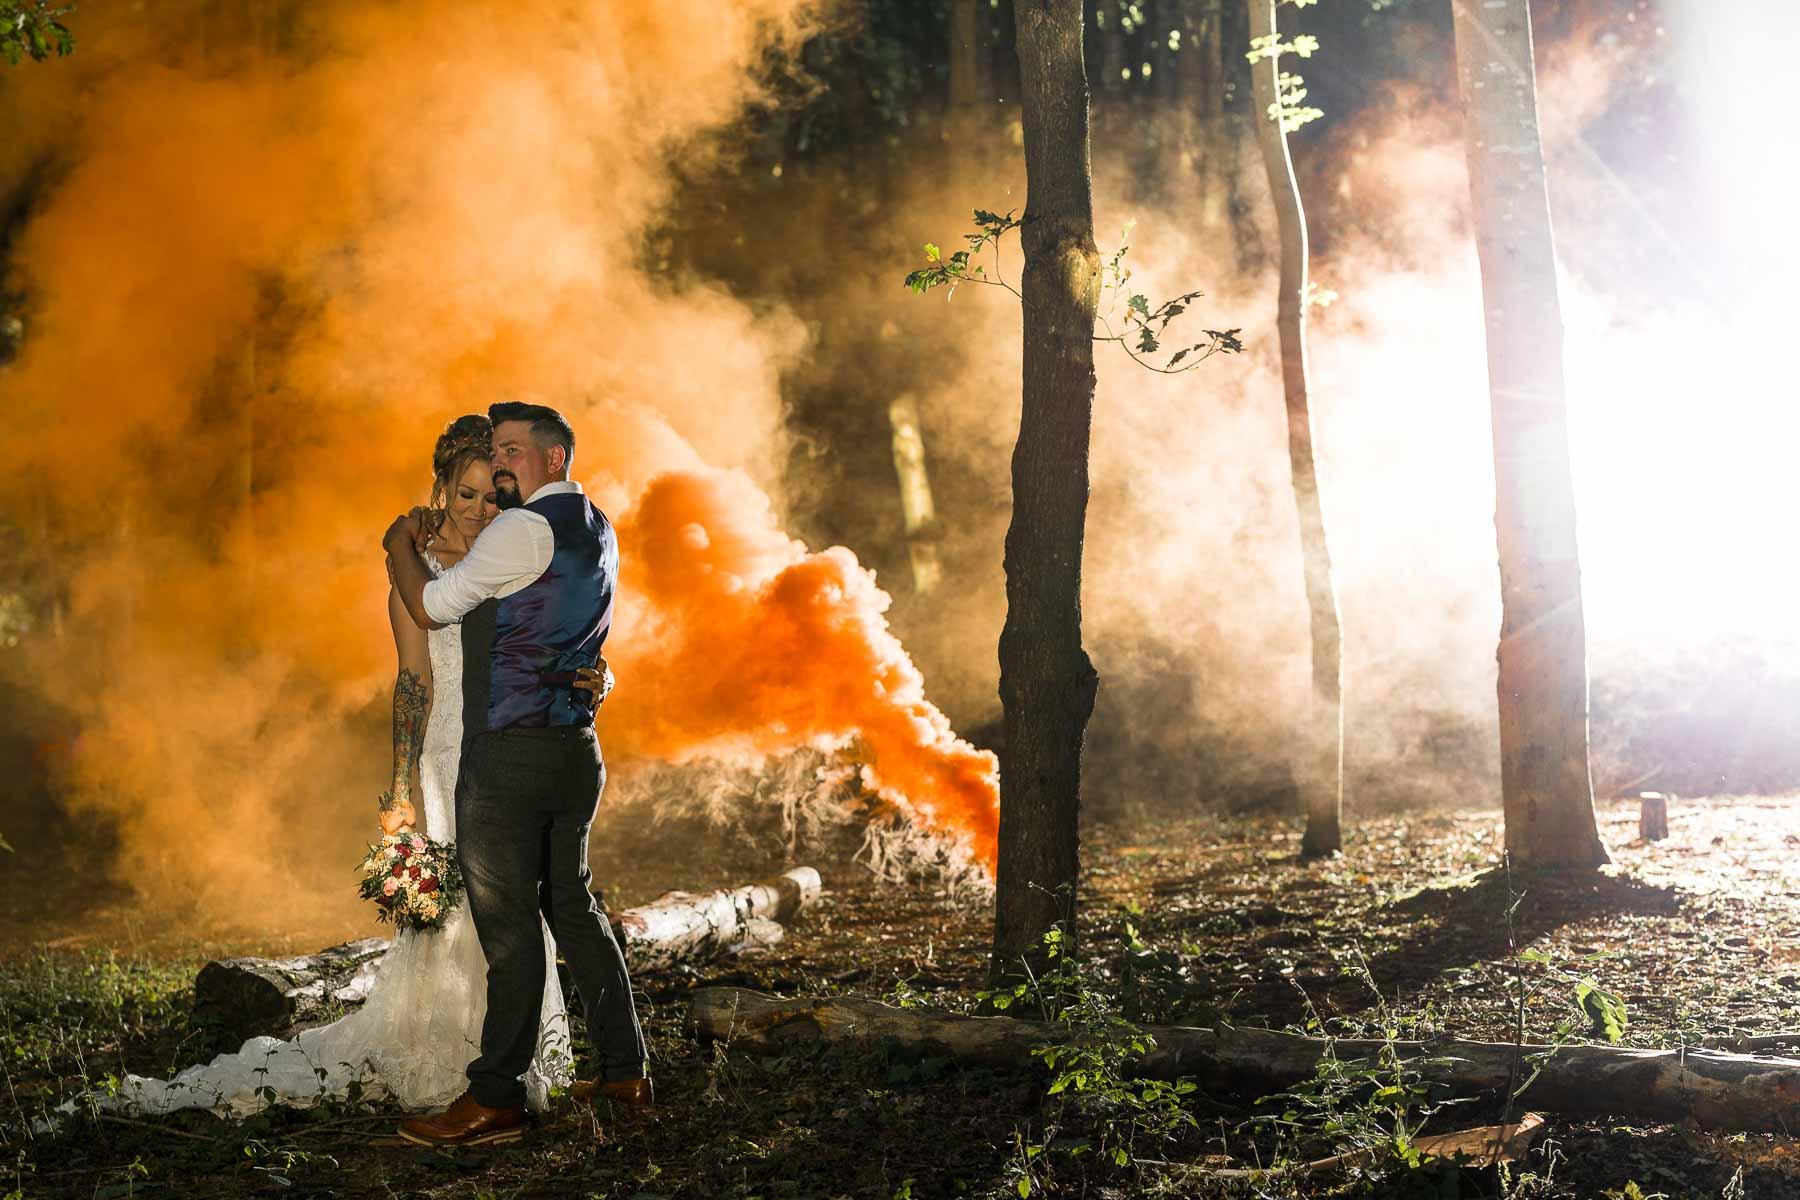 Wedding photo of a bride using enola gaye smoke grenade